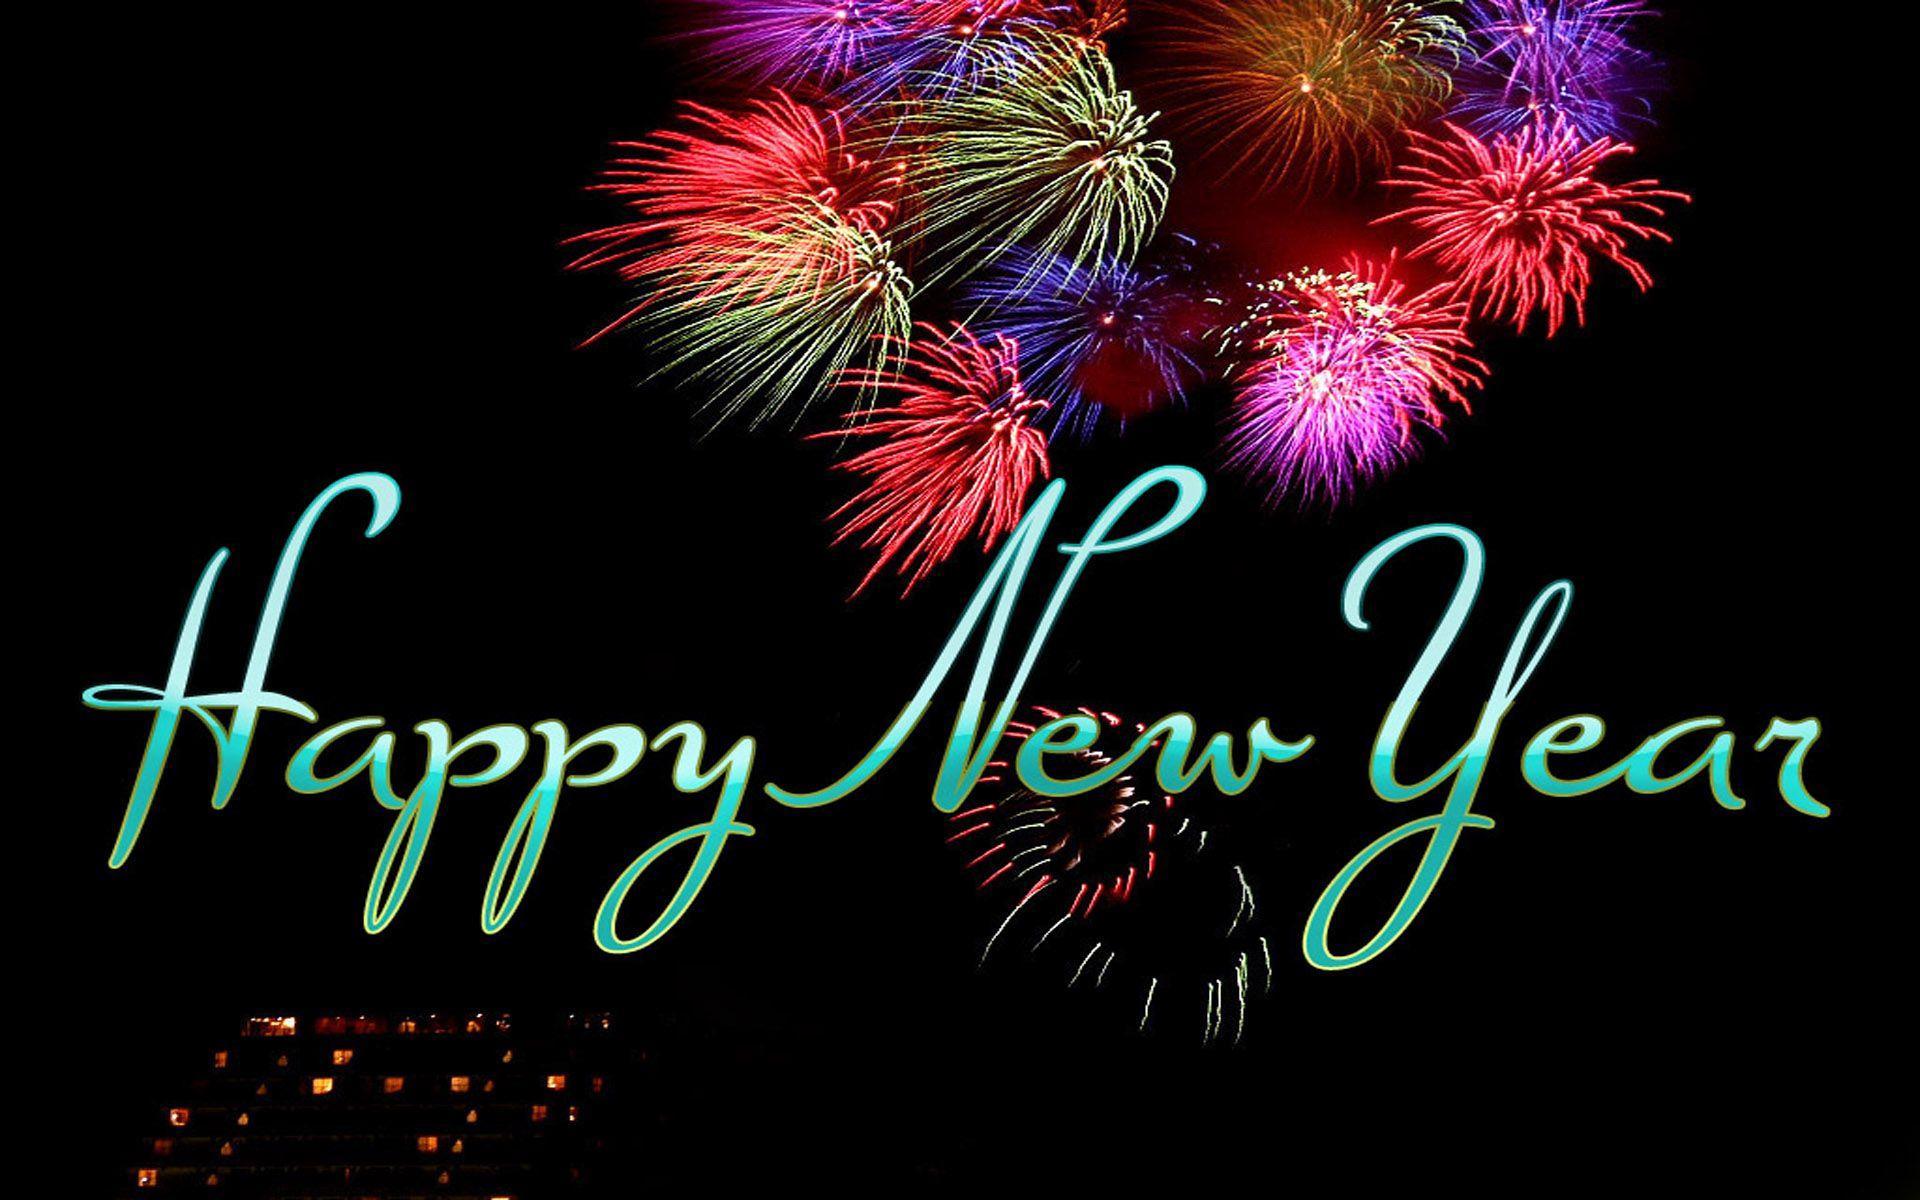 Free download Soo Cute Happy New Year 2015 wallpaper